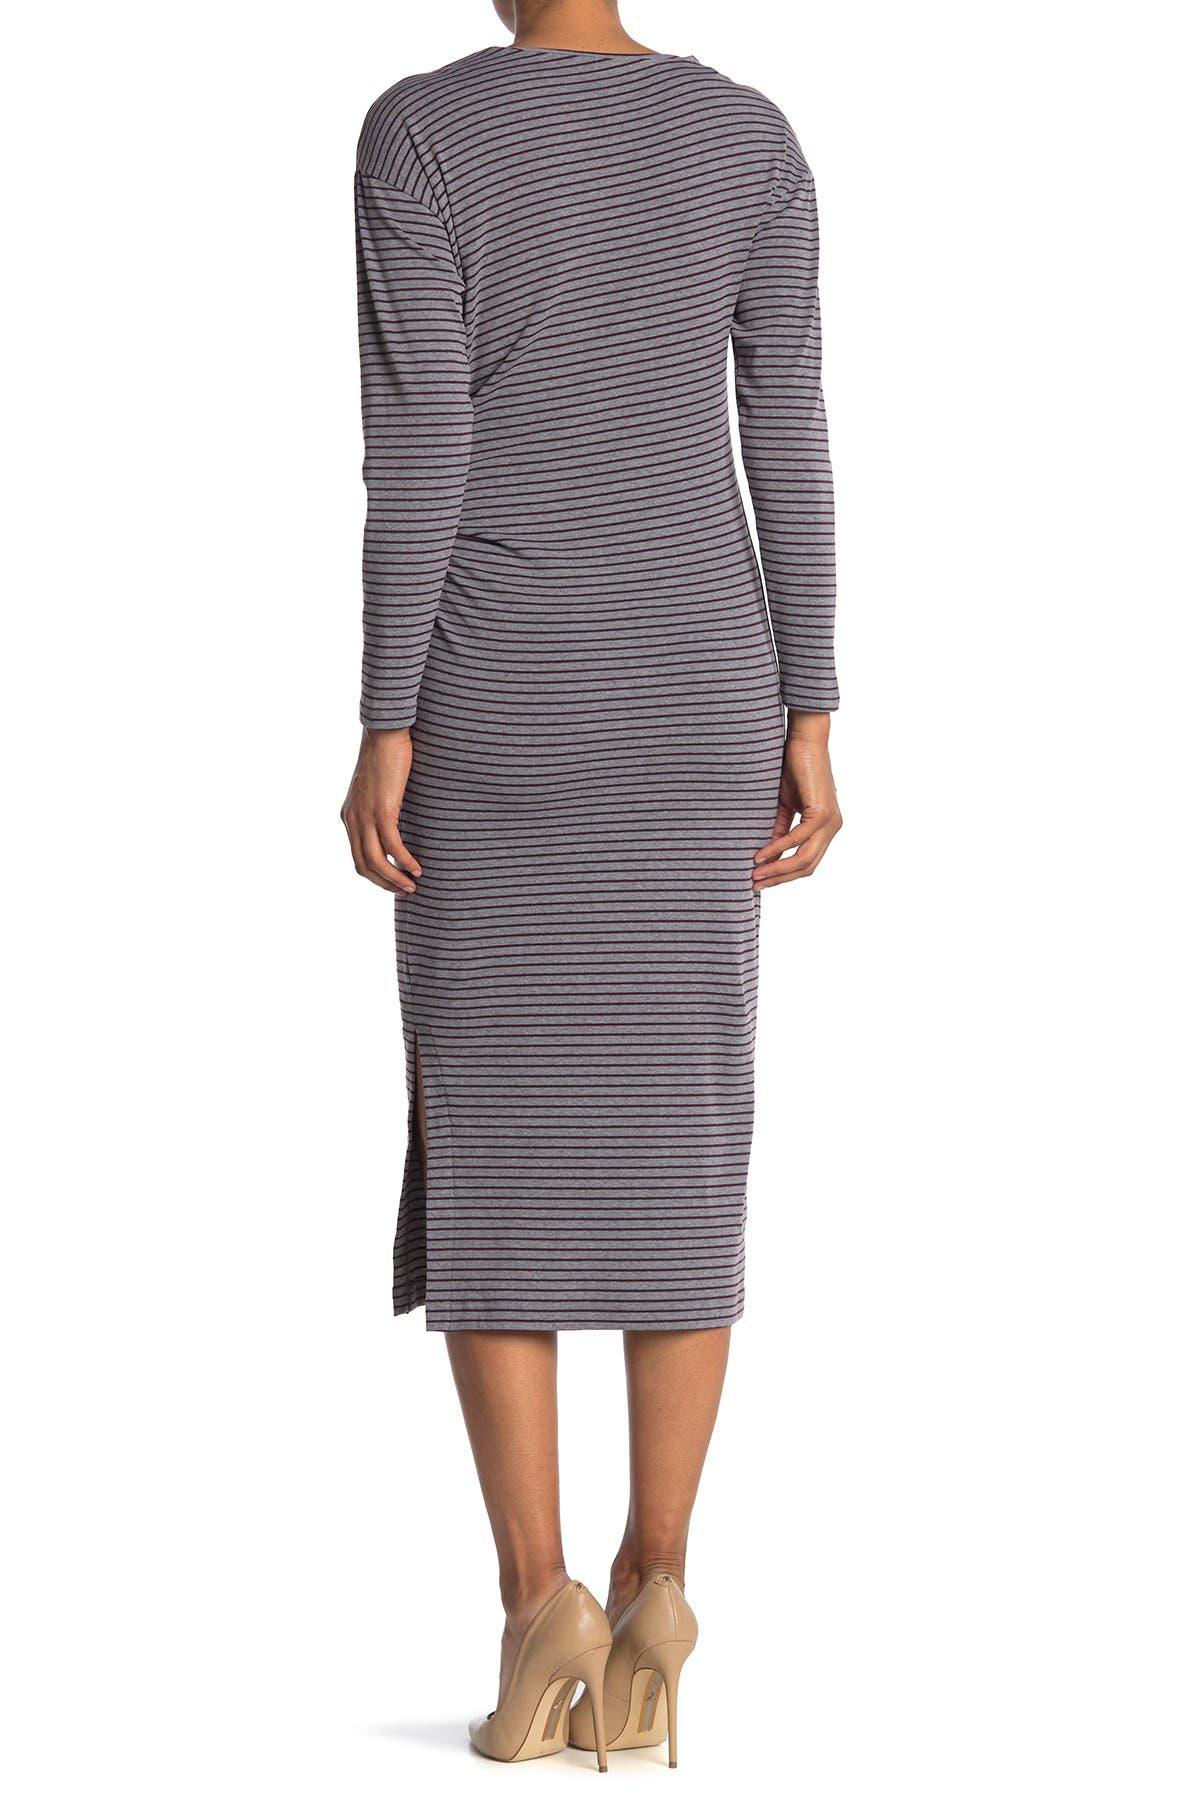 Image of MELLODAY Cozy Striped Long Sleeve Side Tie Midi Dress